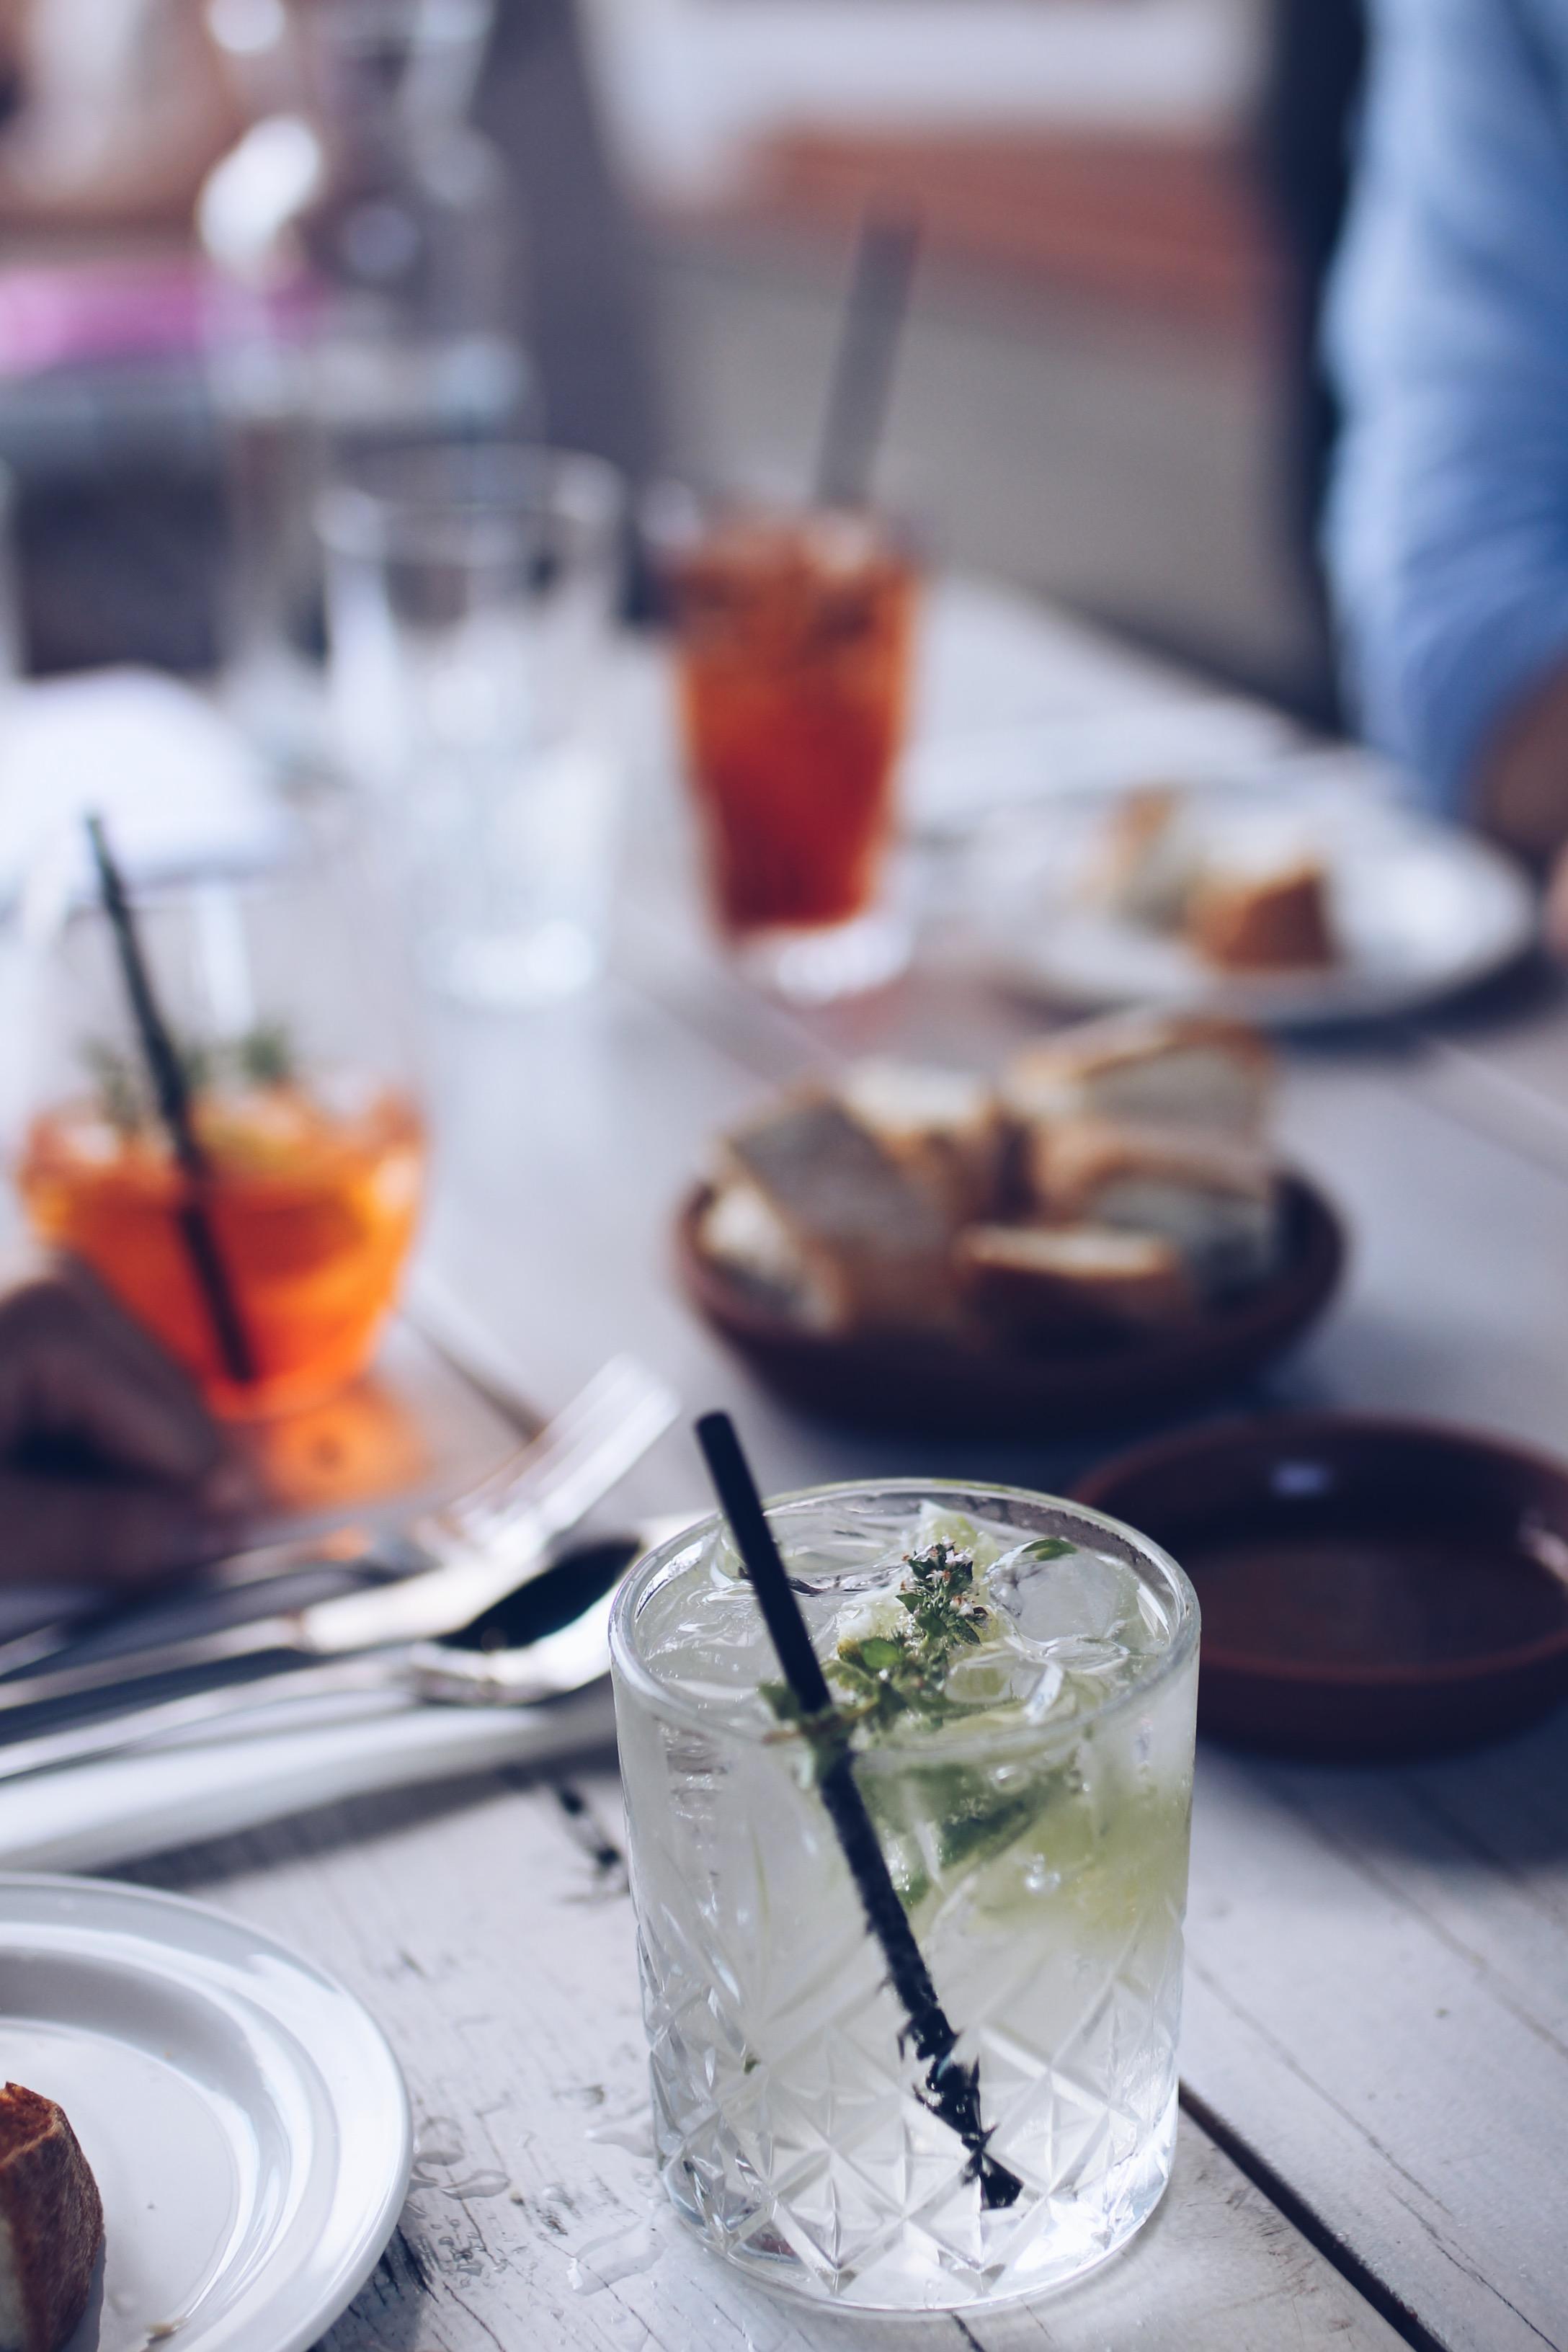 Cocktails at Nino Lorne